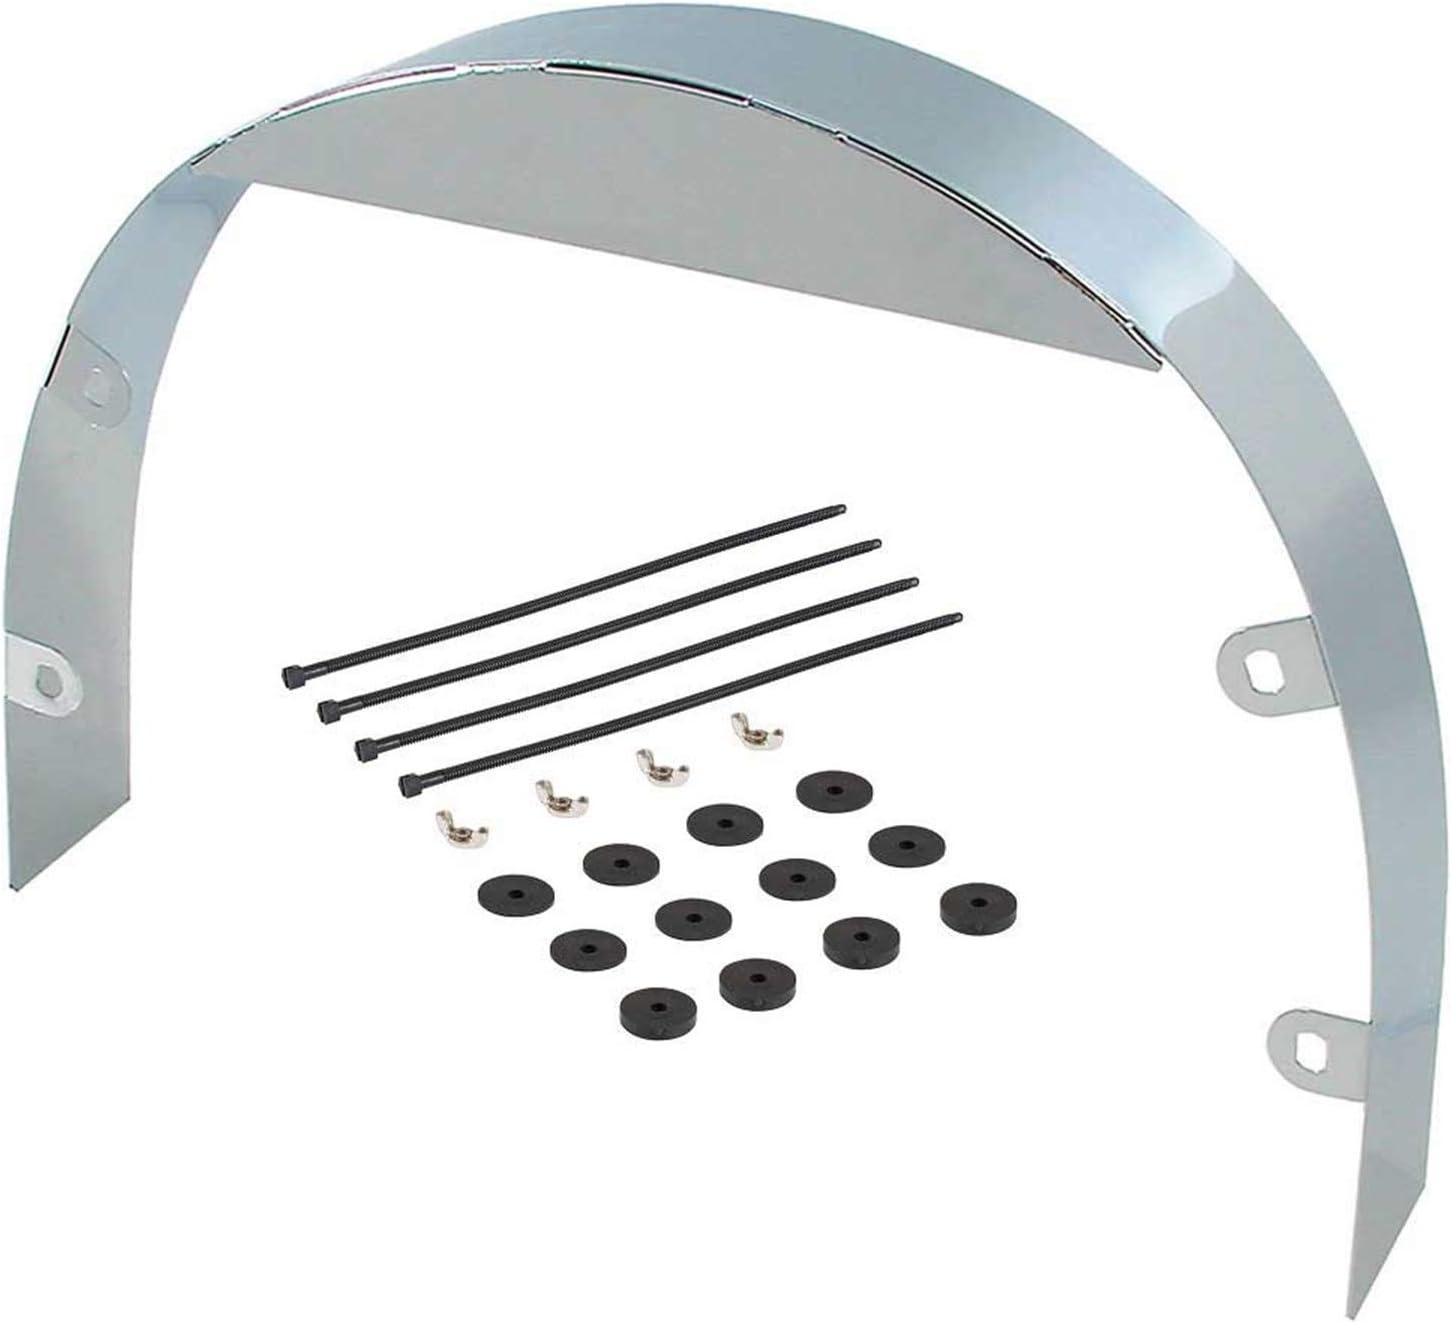 "Spectre Performance 4348 3"" Chrome Fan Shroud"